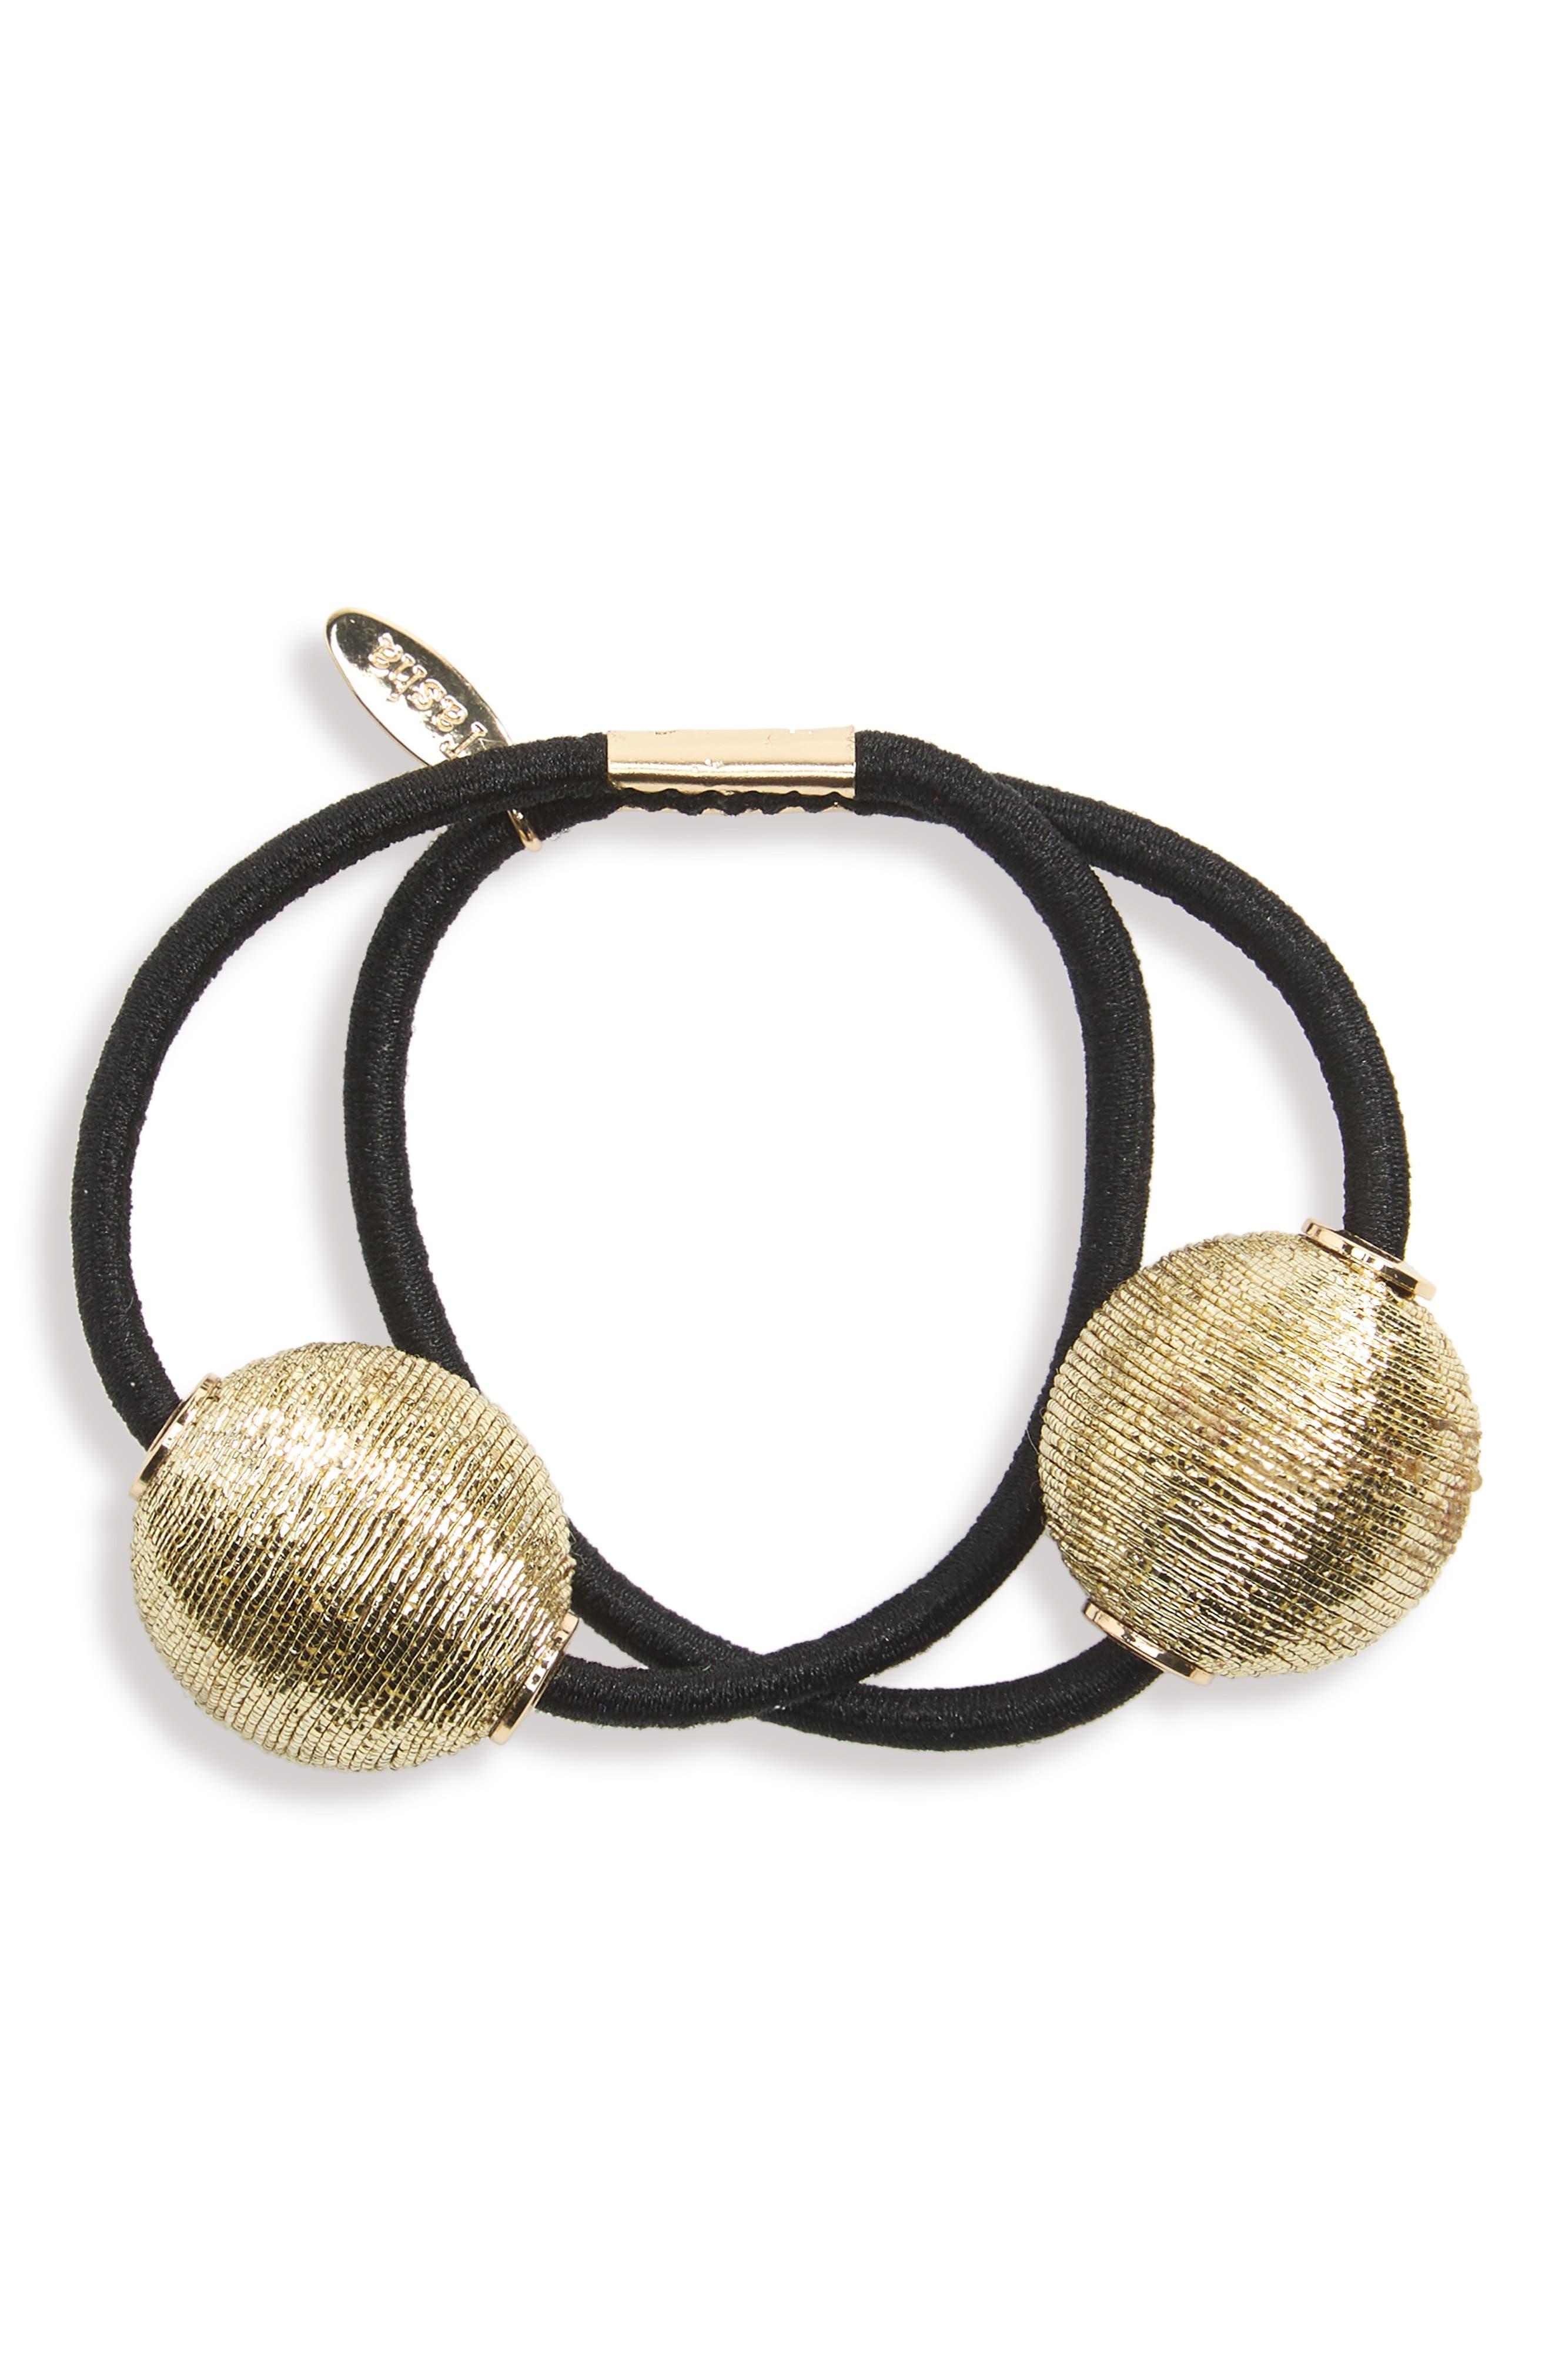 Alternate Image 1 Selected - Tasha Pearly Bead Double Ponytail Holder